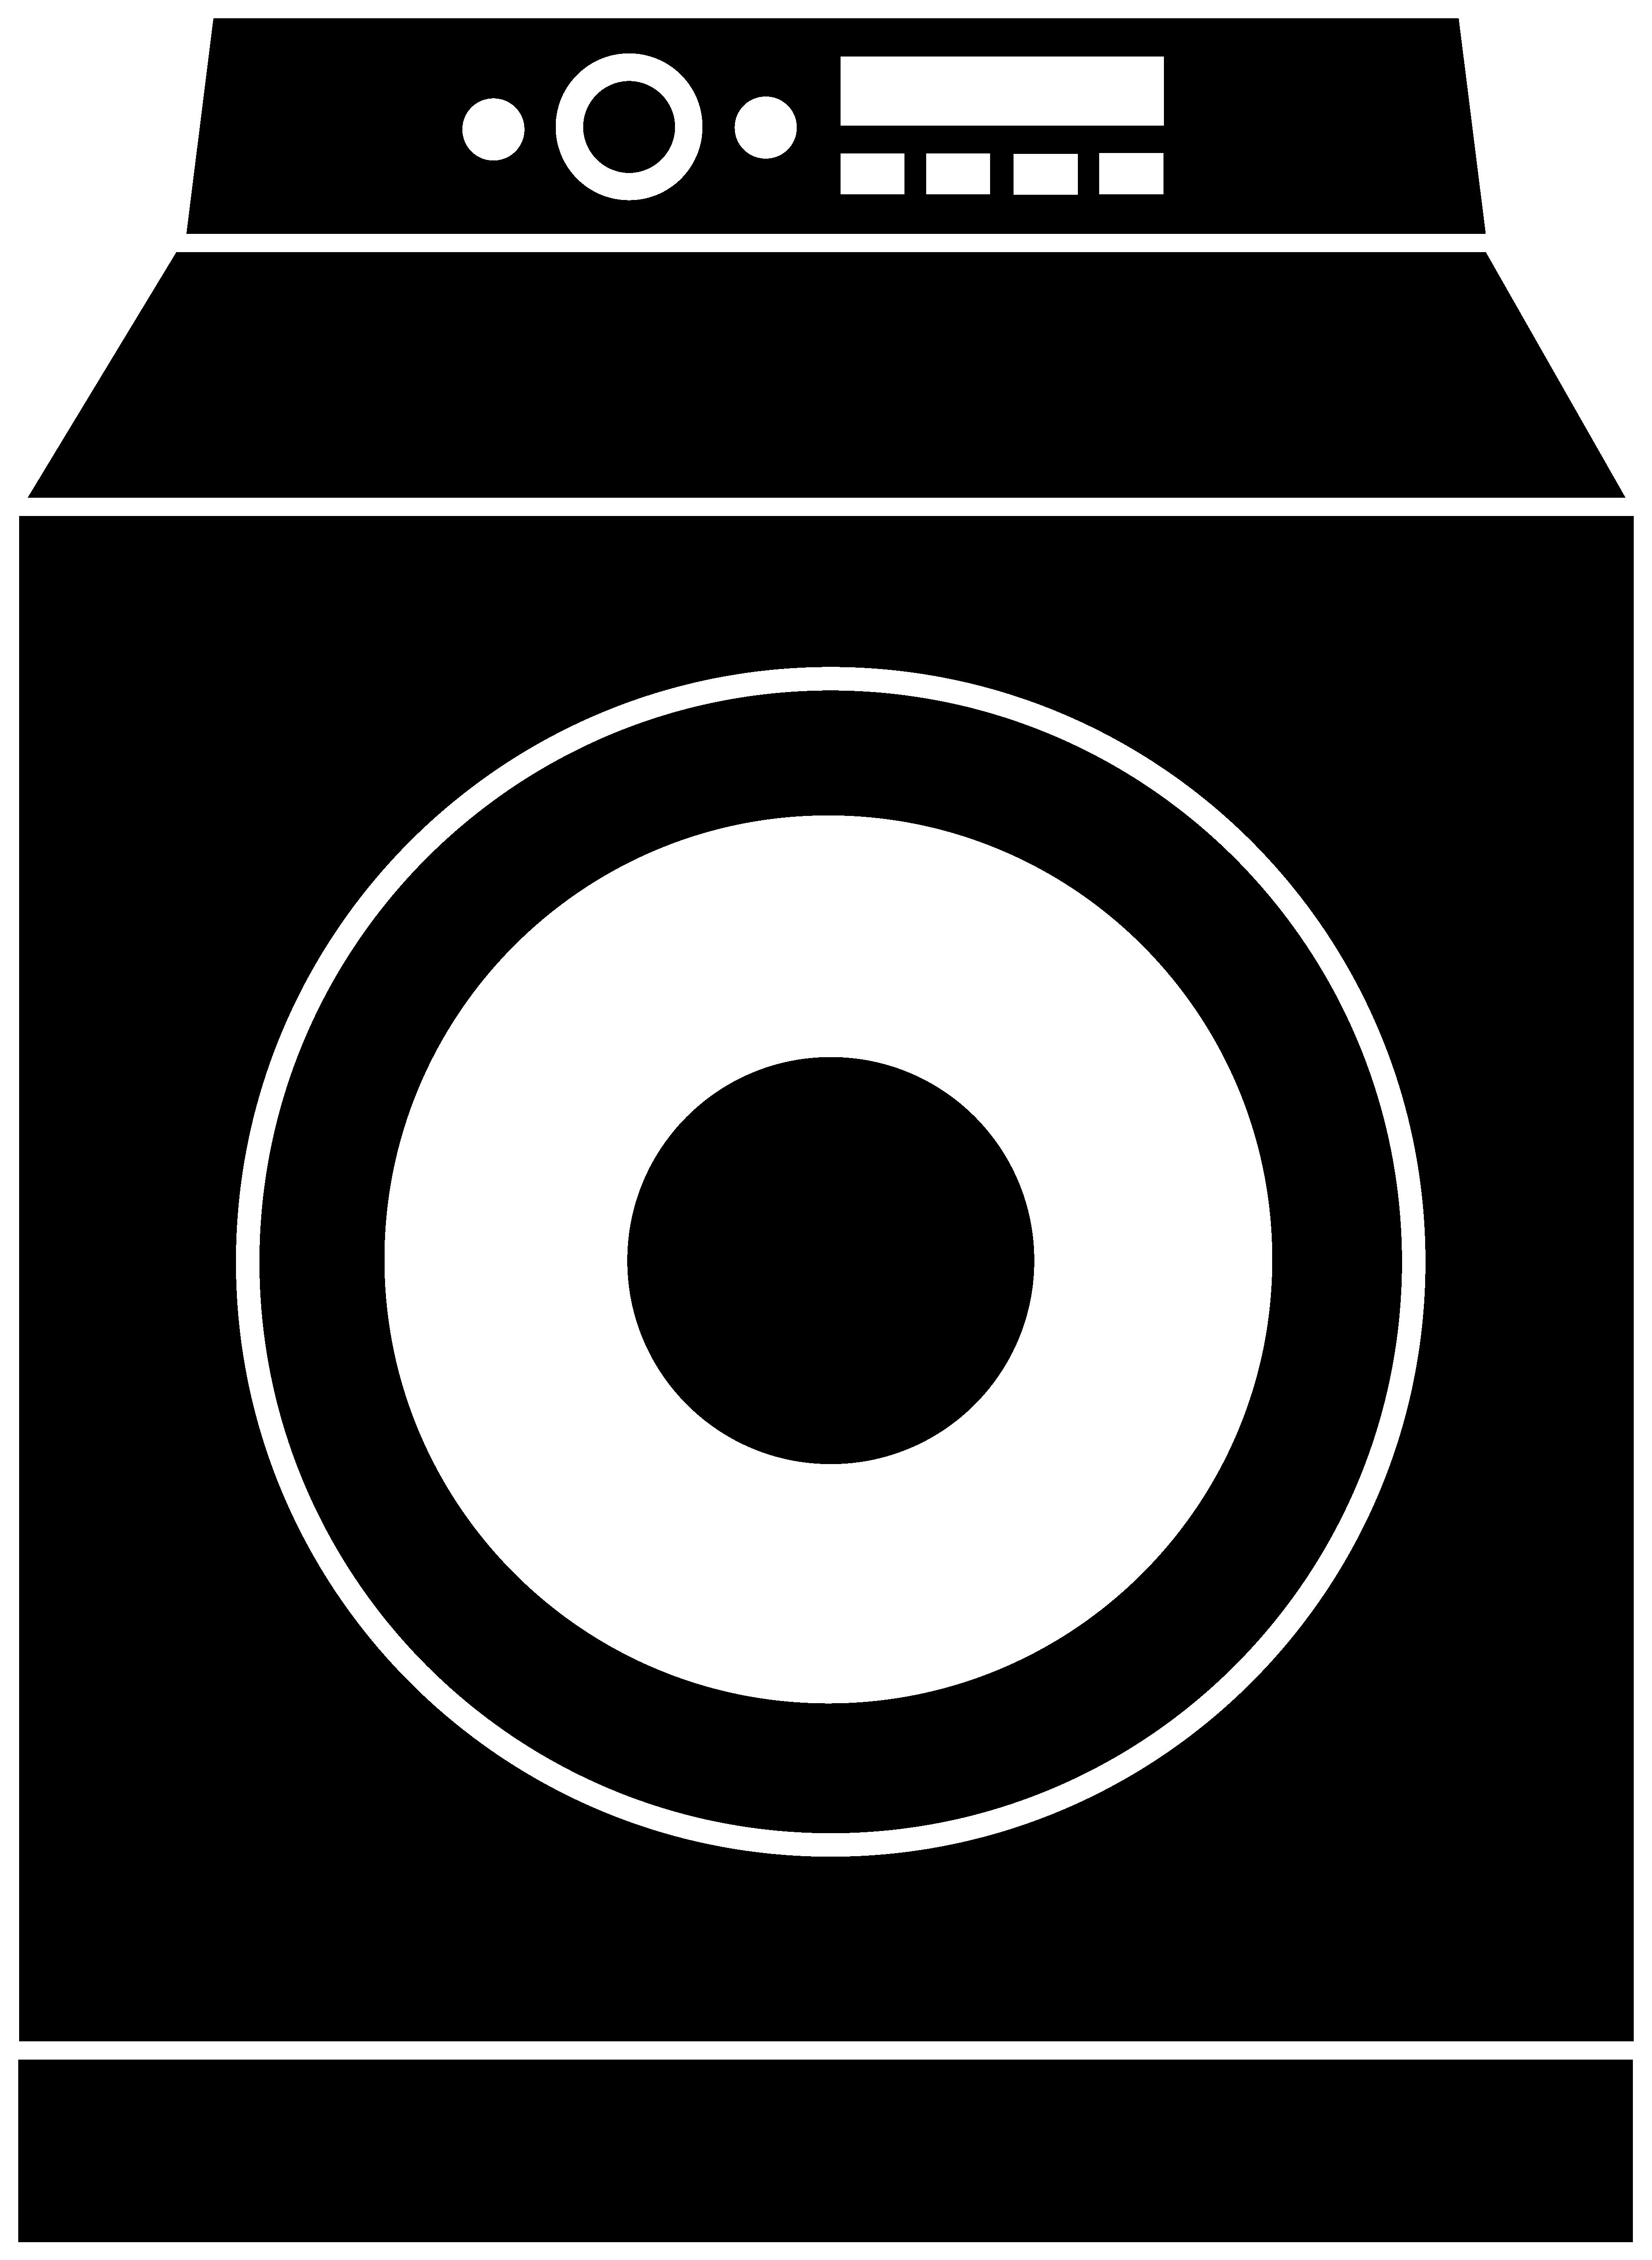 Washing Machine Silhouette Logo.